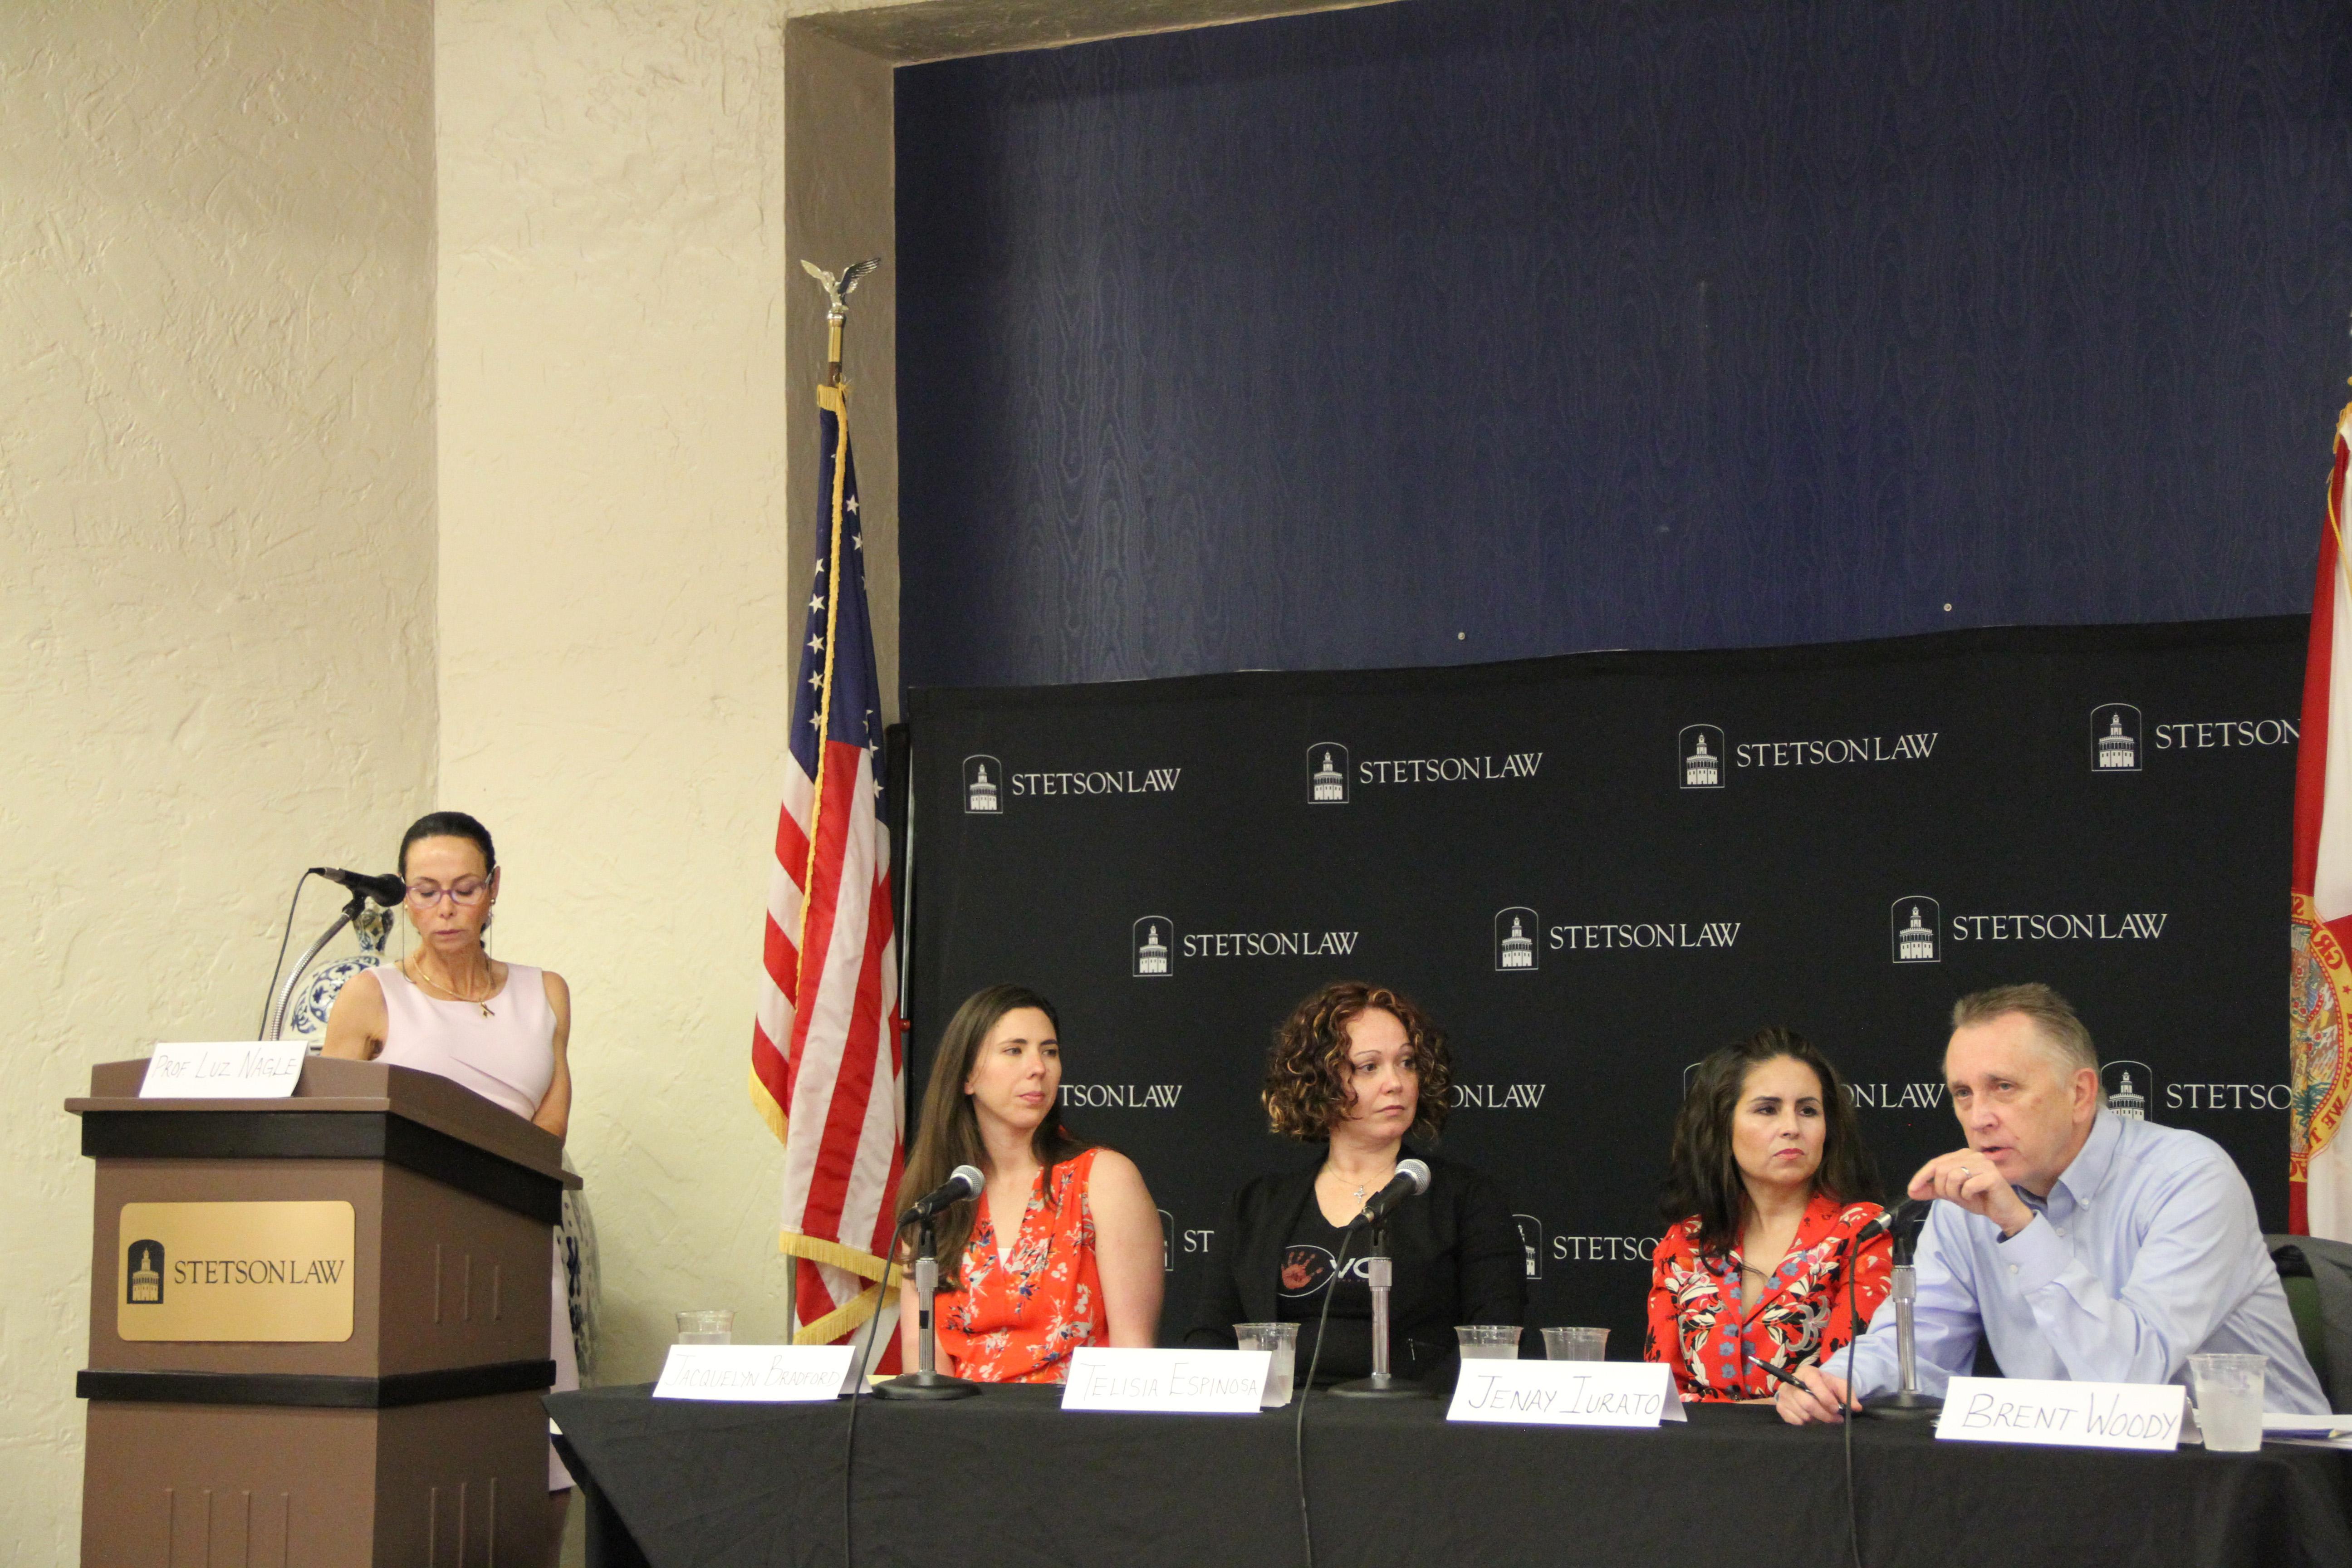 (L-R): Professor Luz Nagle, Jacquelyne Bradford, Telisia Espinosa, Jenay Iurato and Brent Woody. Photo by Merve Ozcan.